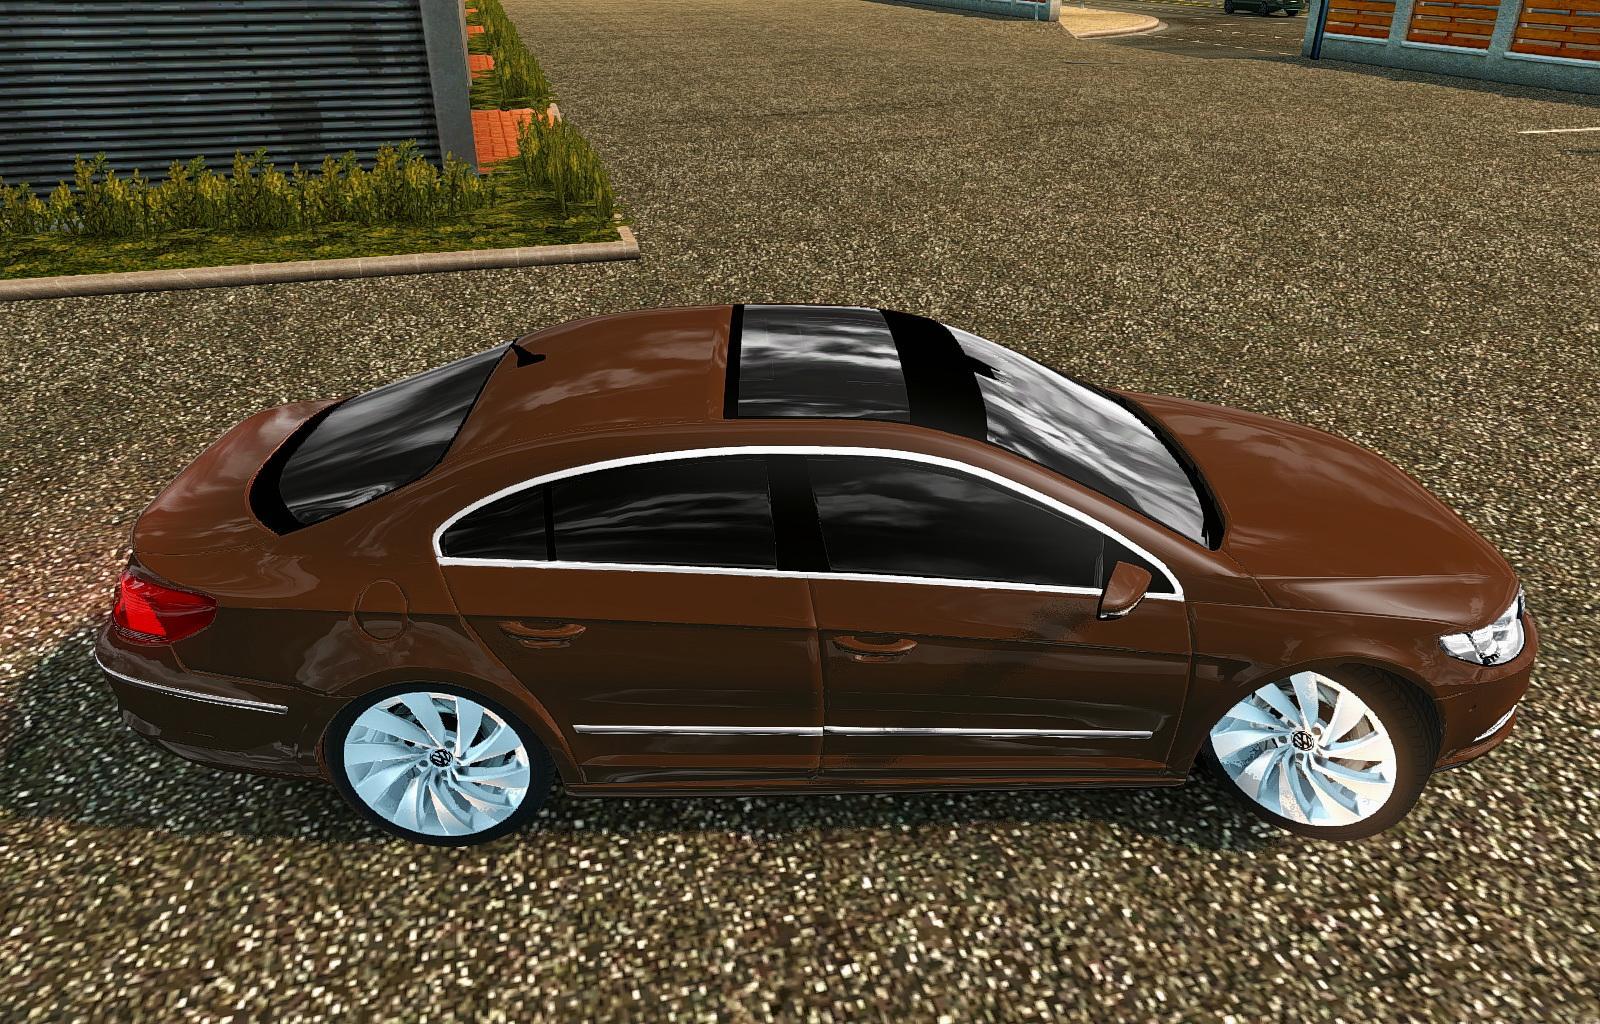 2013 volkswagen passat cc 2018 arteon car mod euro truck simulator 2 mods. Black Bedroom Furniture Sets. Home Design Ideas